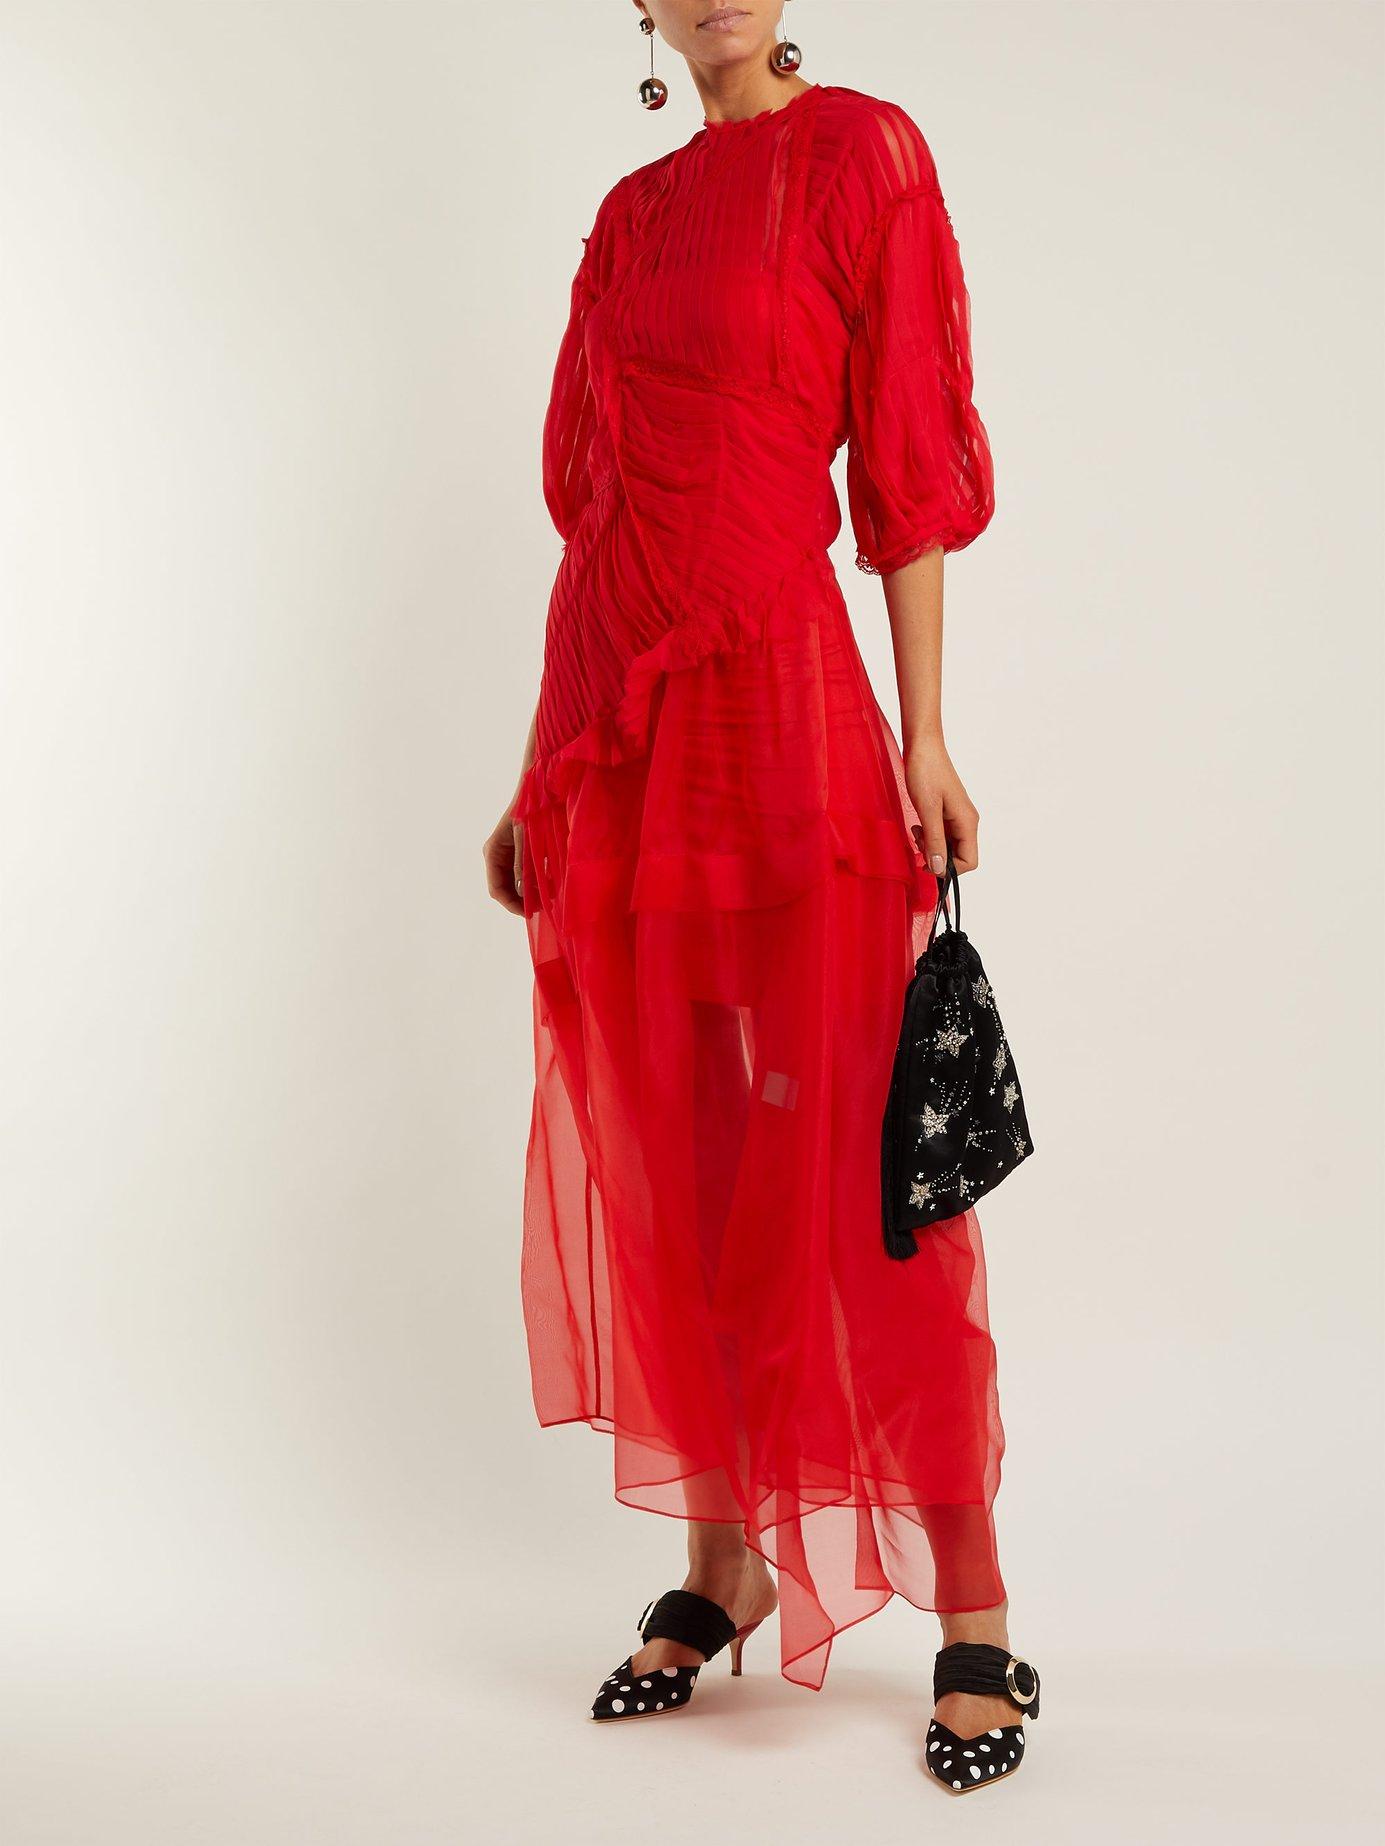 Risse pleated-panel silk dress by Preen By Thornton Bregazzi